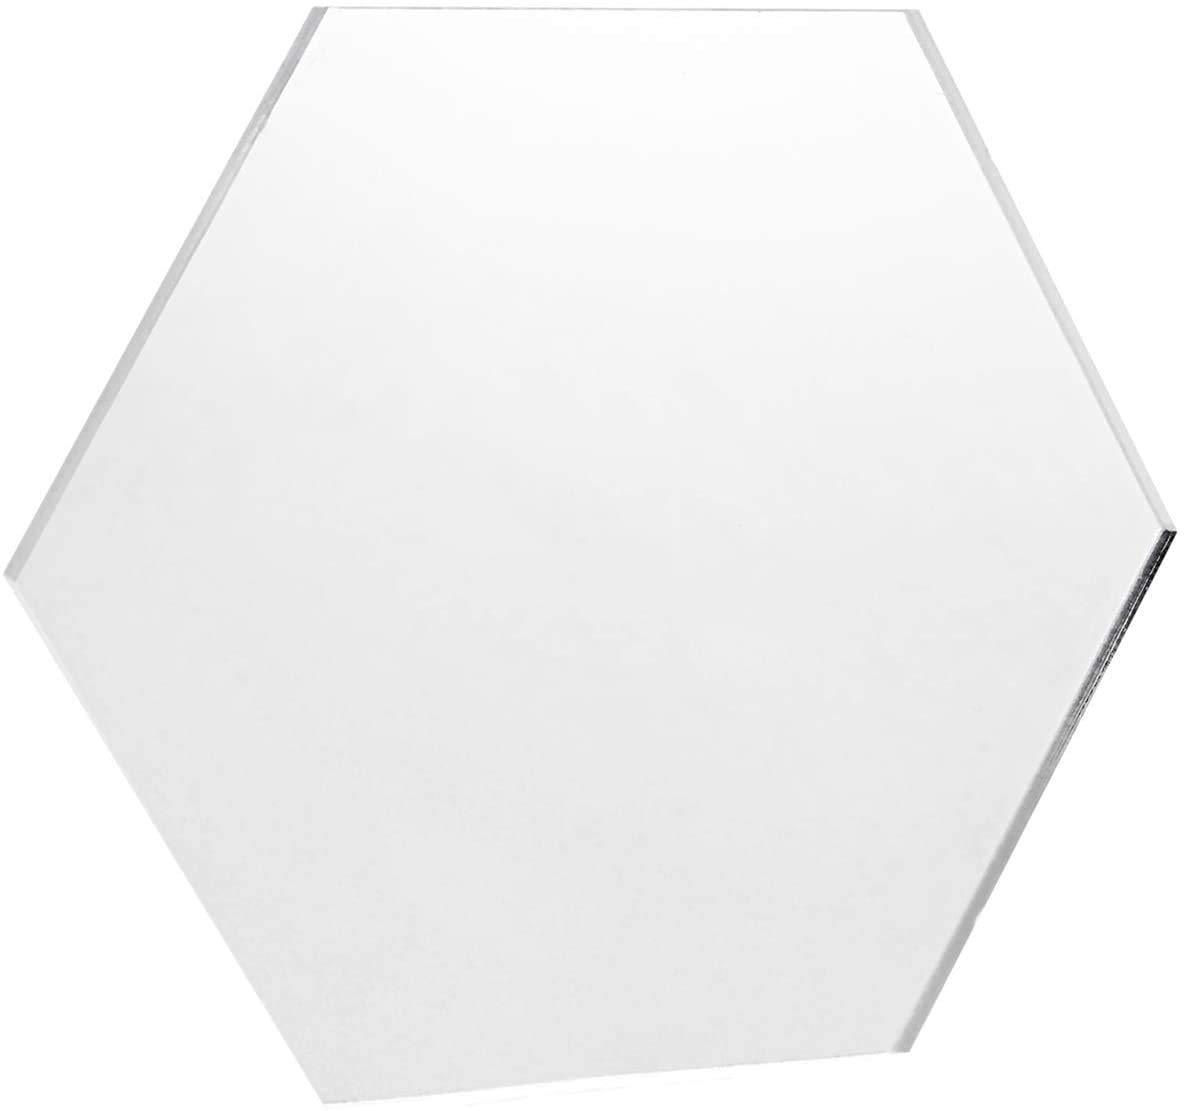 KastLite Clear Acrylic Hexagon | Plexiglass Hexagon with Custom Measurements | Selection: 1/16